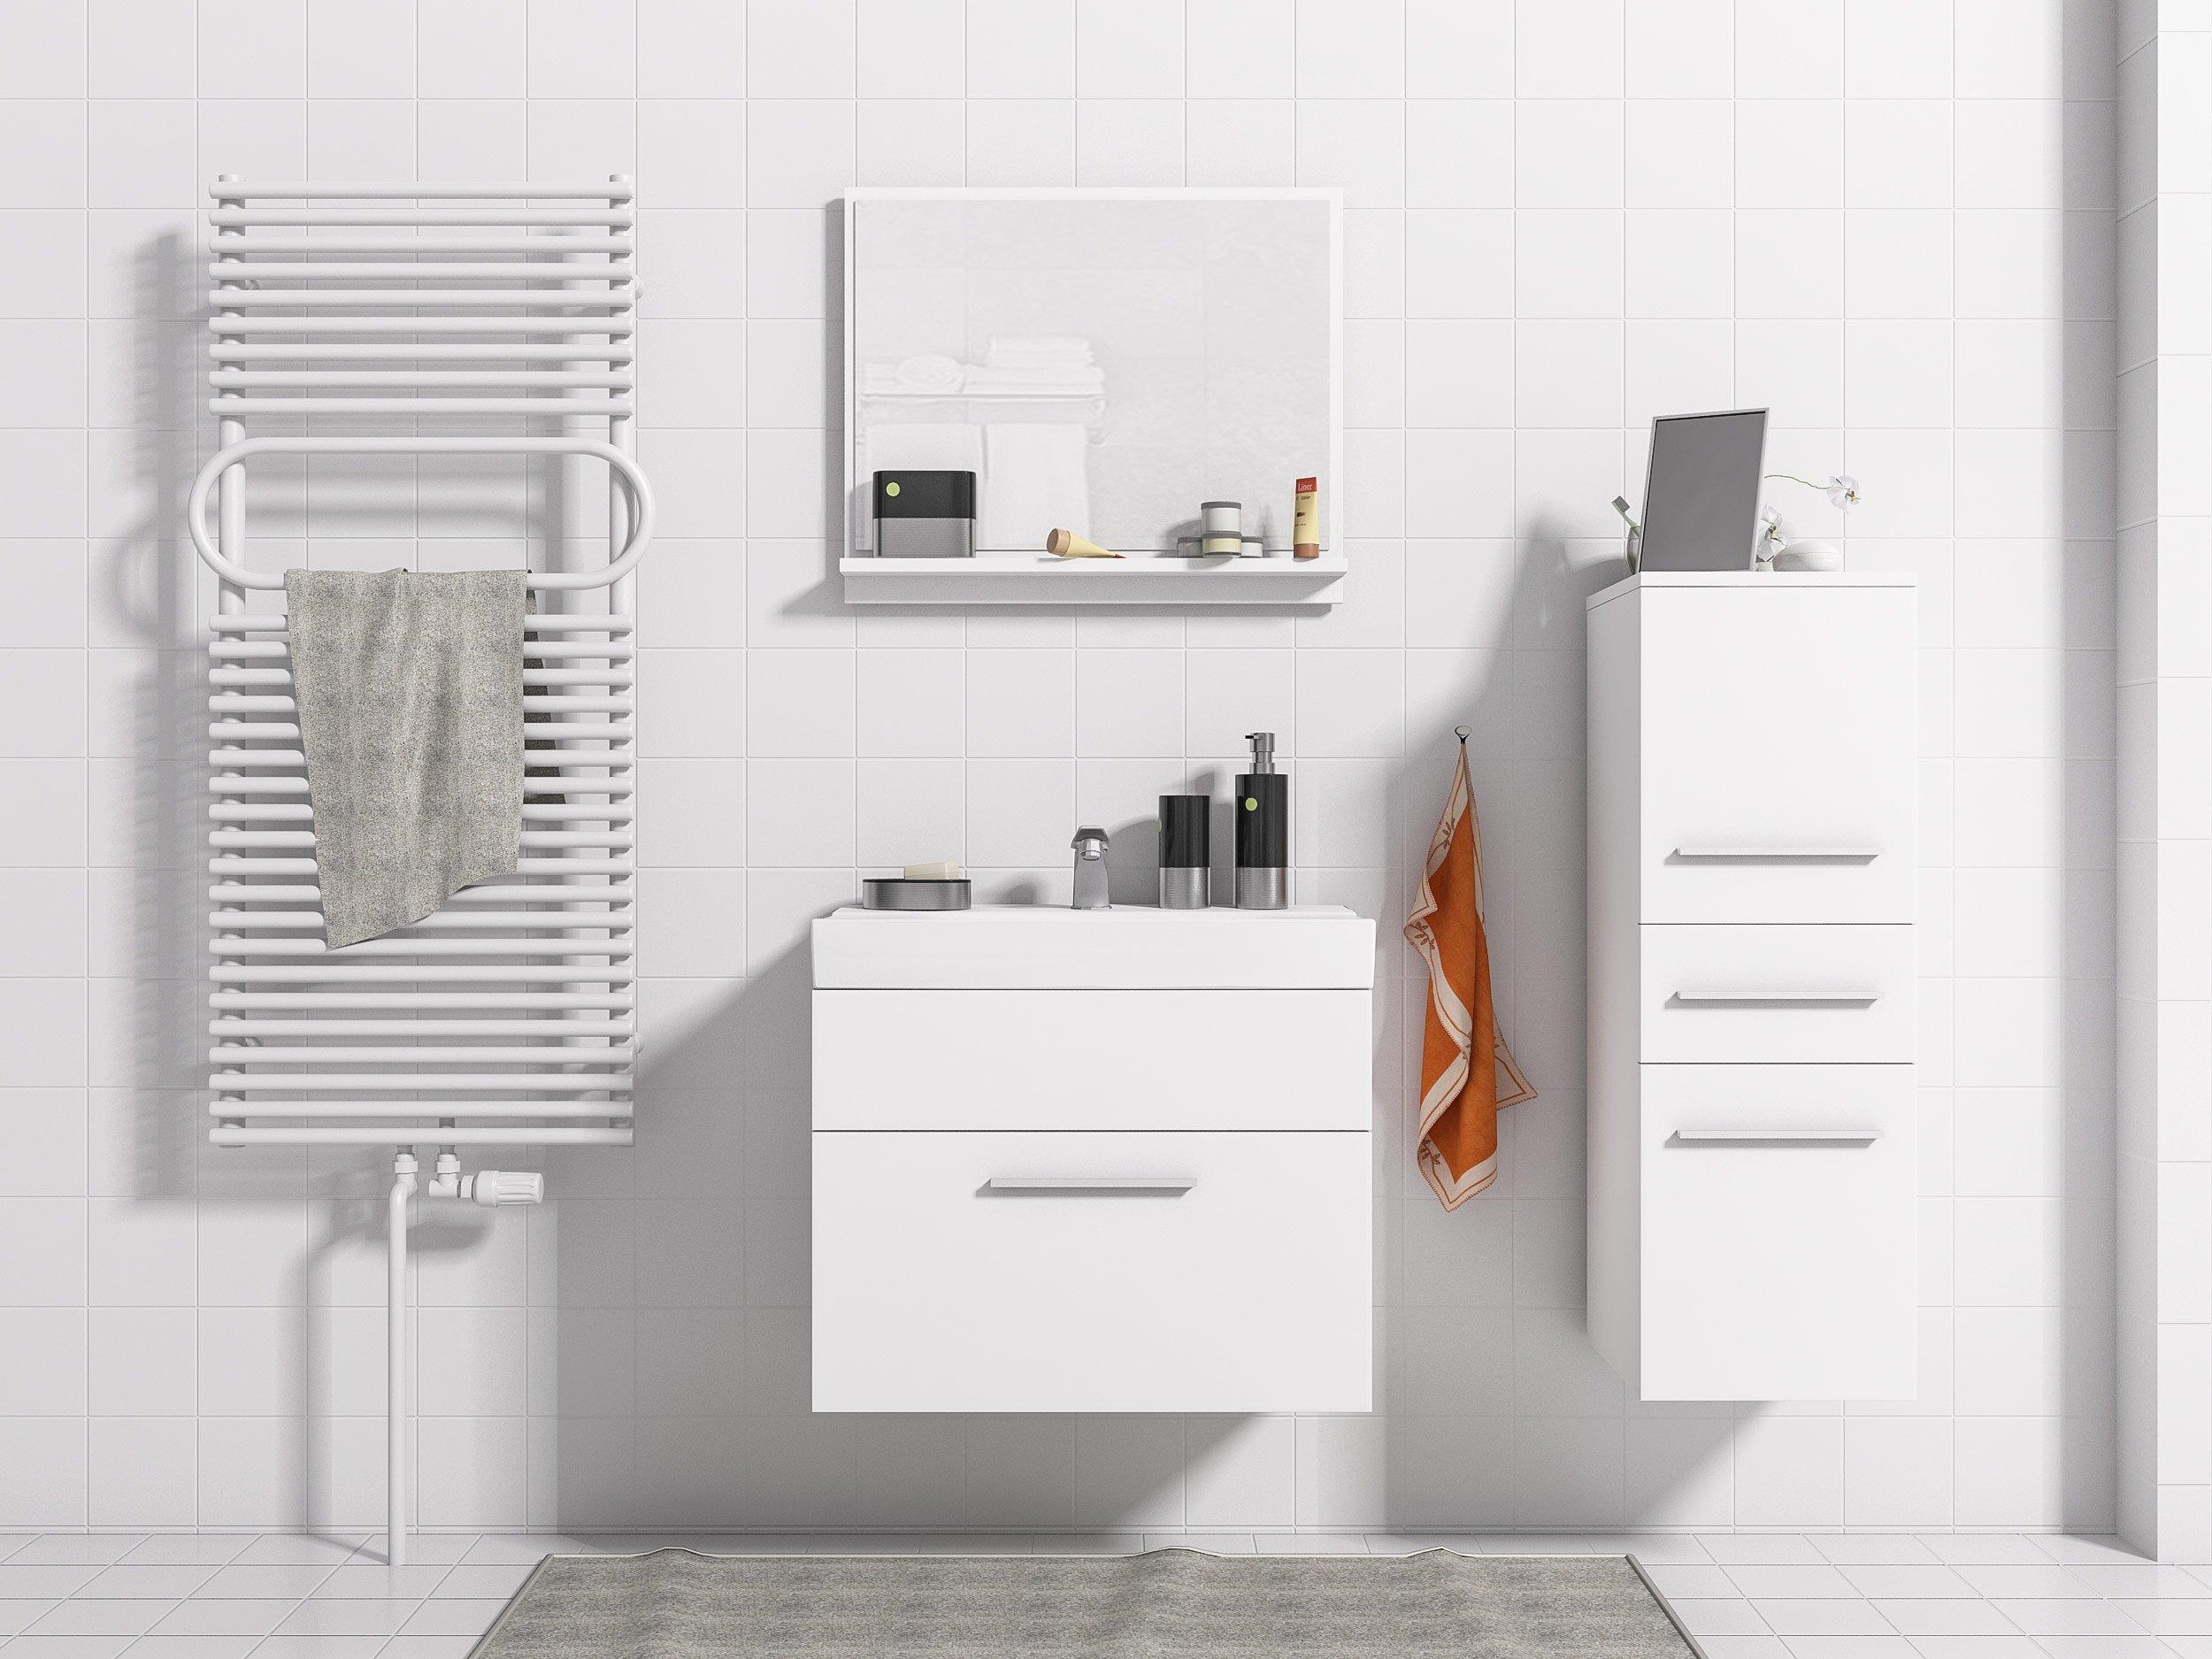 Kúpeľňa TIPO MINI 2 nočné stolíky, zrkadlo MEBLOHAUS